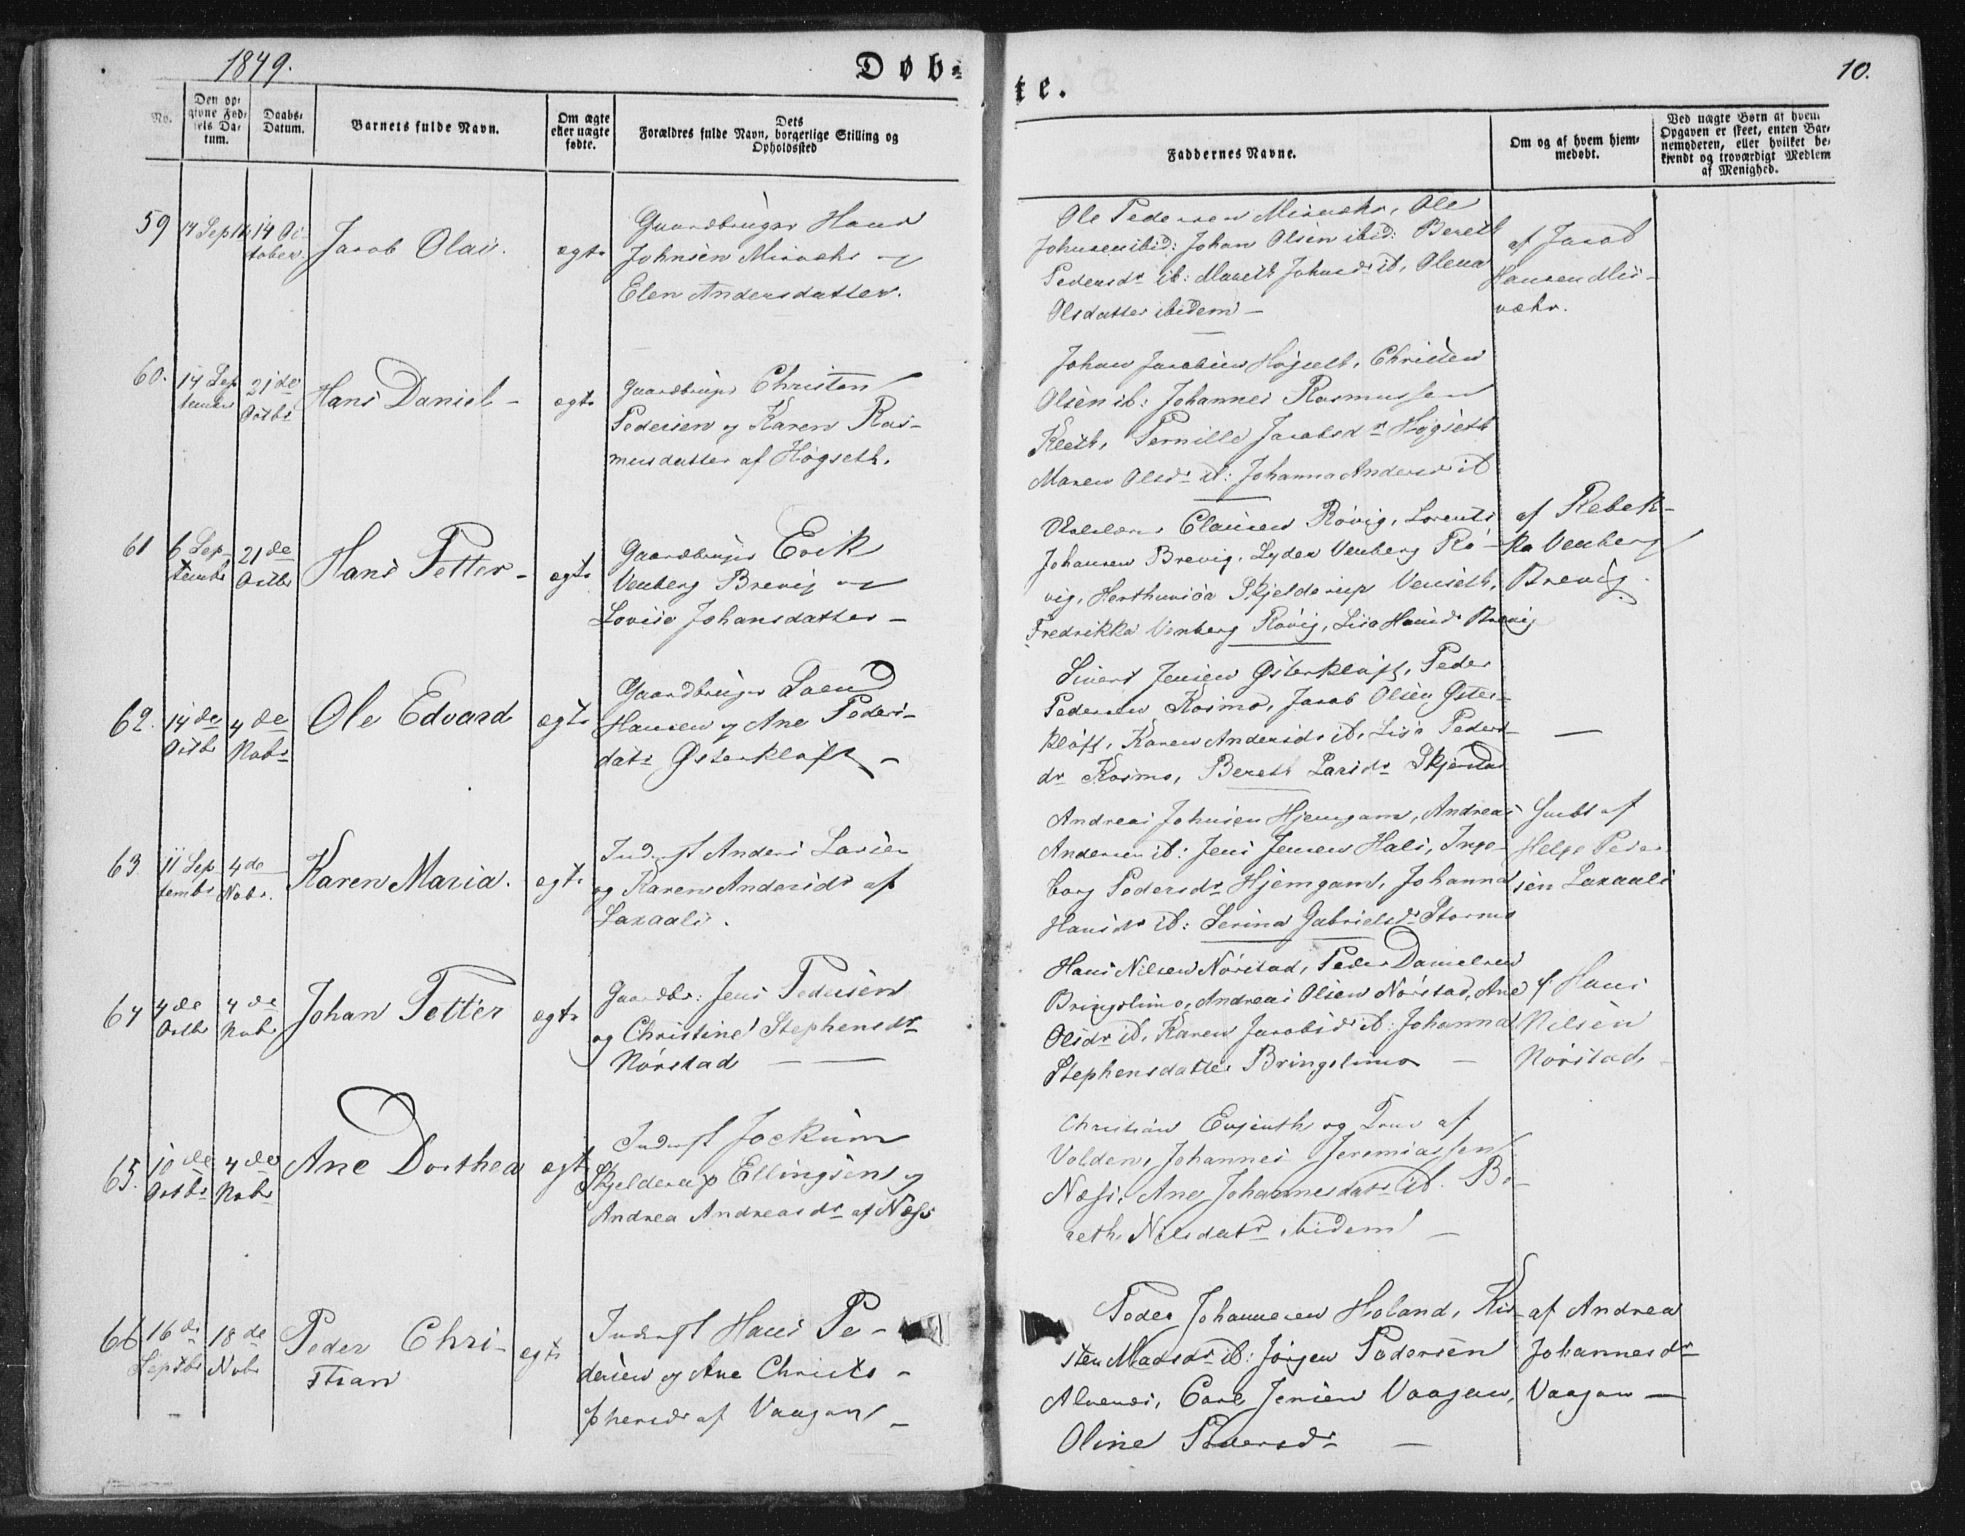 SAT, Ministerialprotokoller, klokkerbøker og fødselsregistre - Nordland, 852/L0738: Ministerialbok nr. 852A08, 1849-1865, s. 10